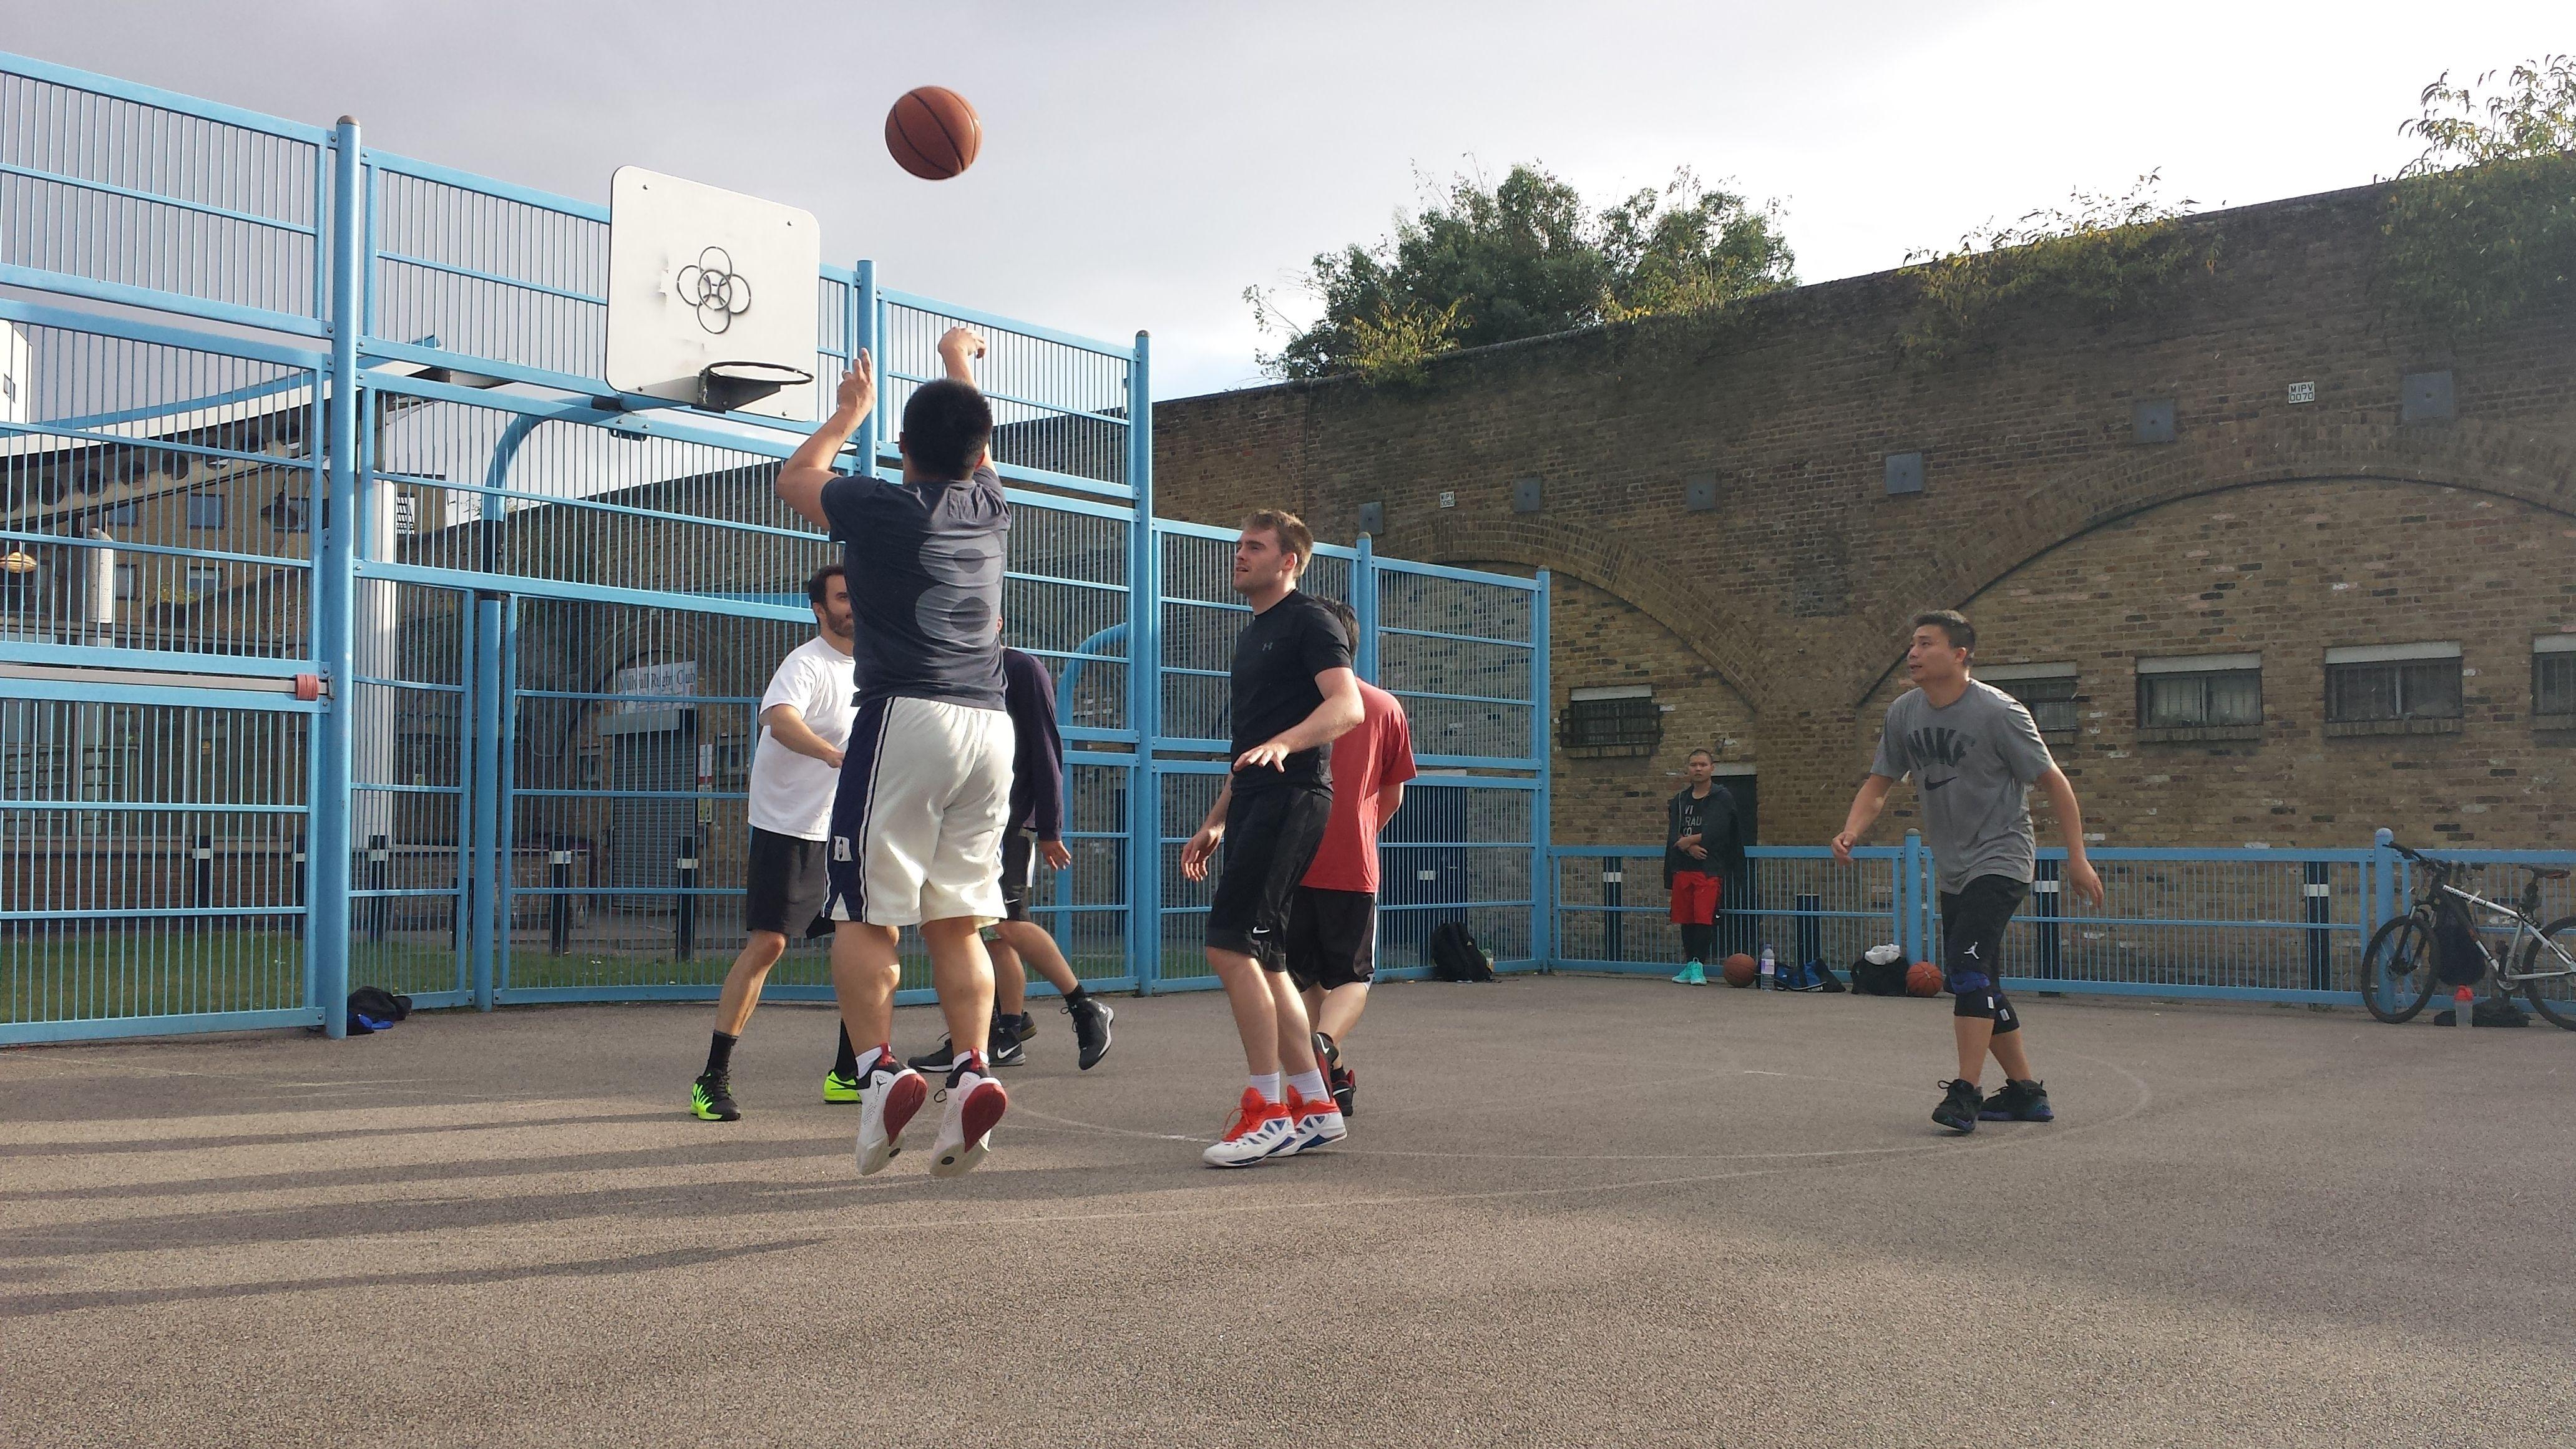 1hr britannia leisure centre mixed half court indoor for Indoor half court basketball cost